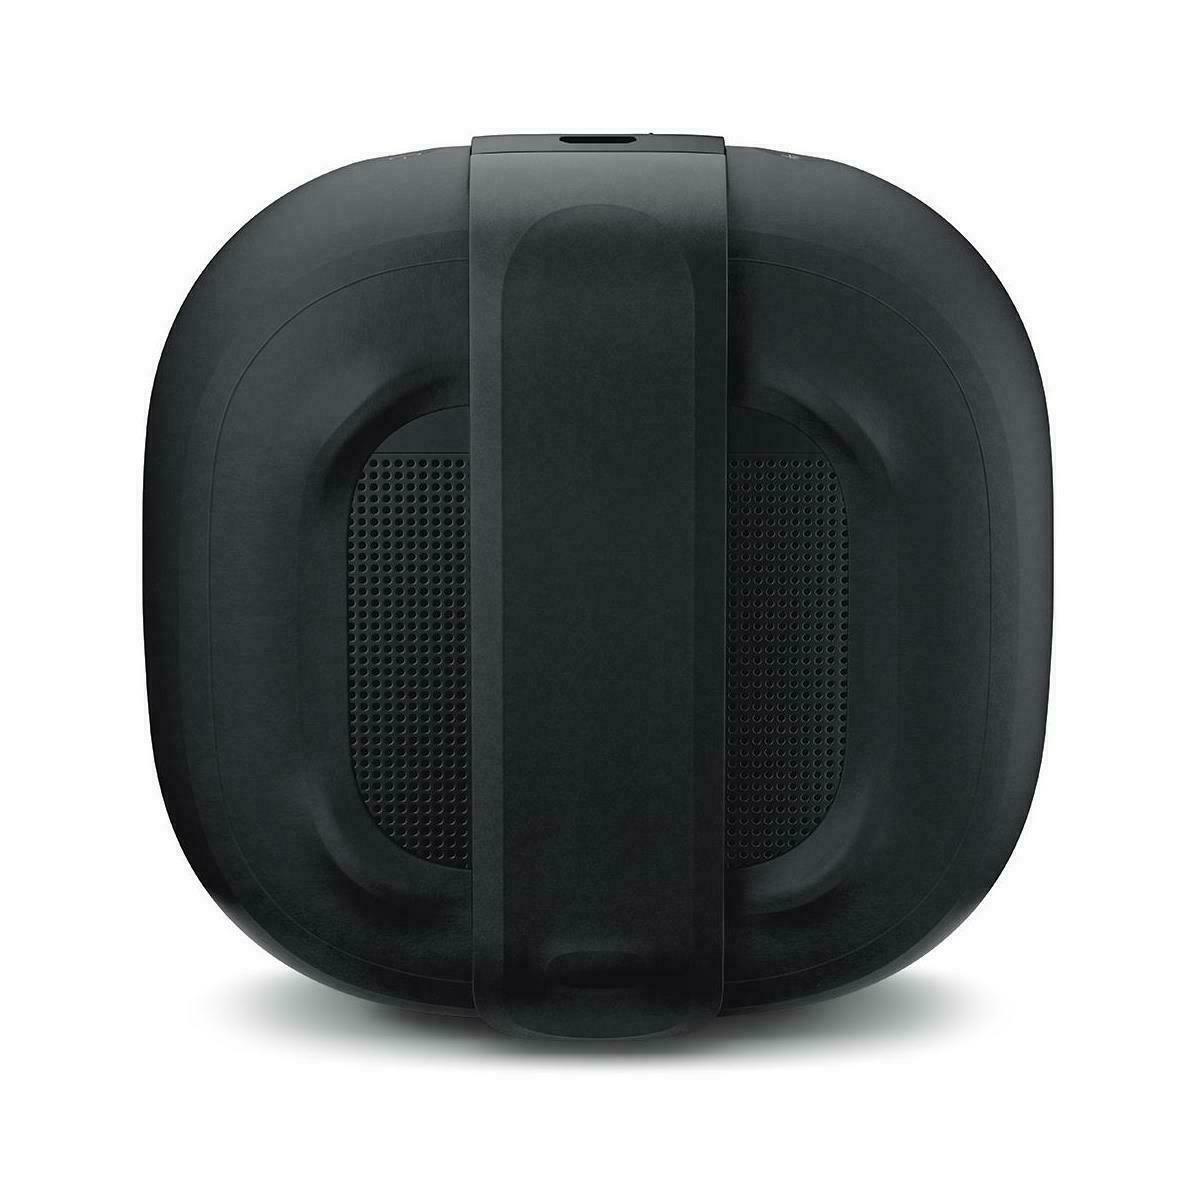 Bose SoundLink Micro Bluetooth speaker - &